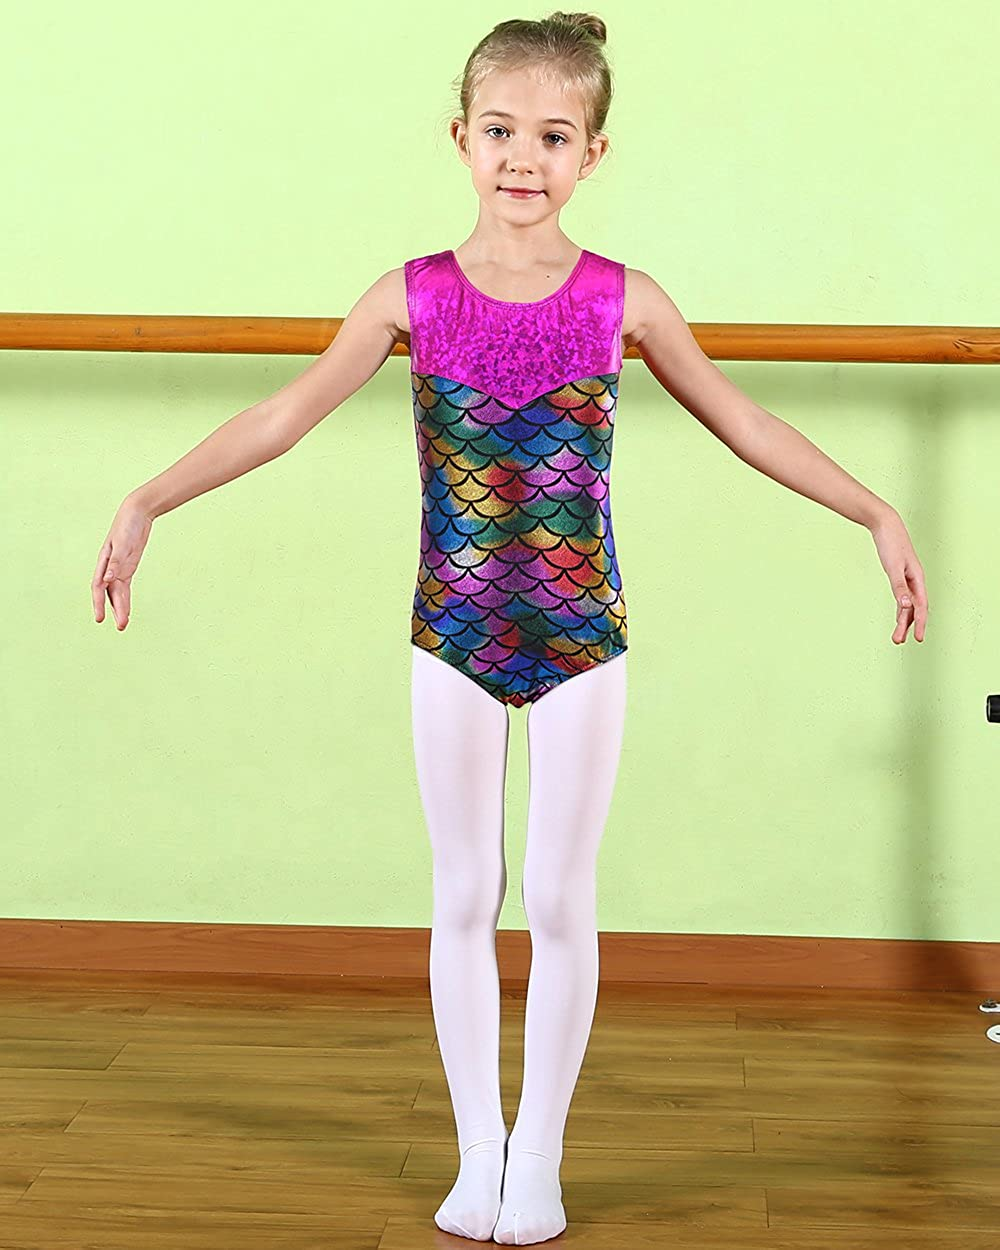 ee930f57b037 Amazon.com  BAOHULU Girls Leotards Gymnastics Shiny Spliced Scale ...